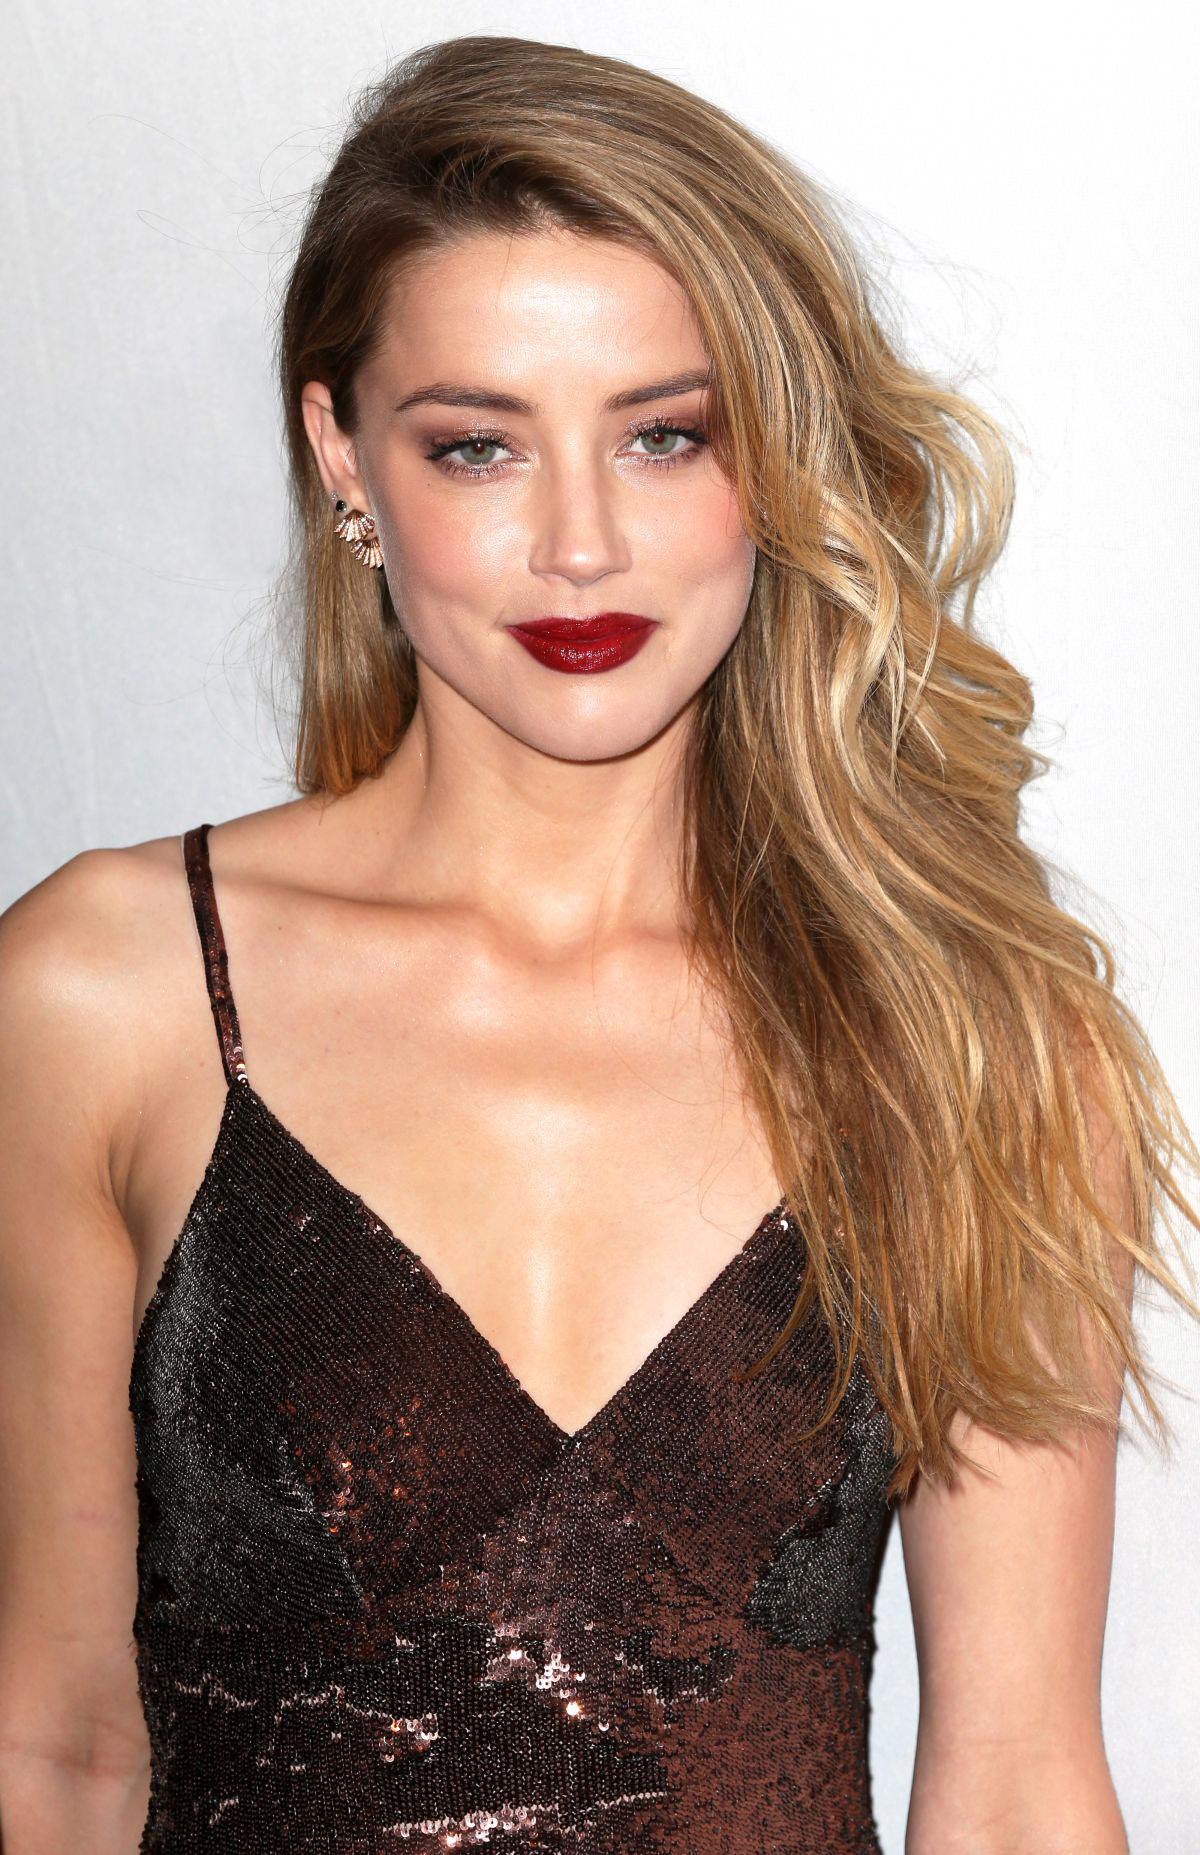 ♥ ♥ ♥ Gorgeous Amber ♥ ♥ ♥ - Amber Heard Photo (40284503